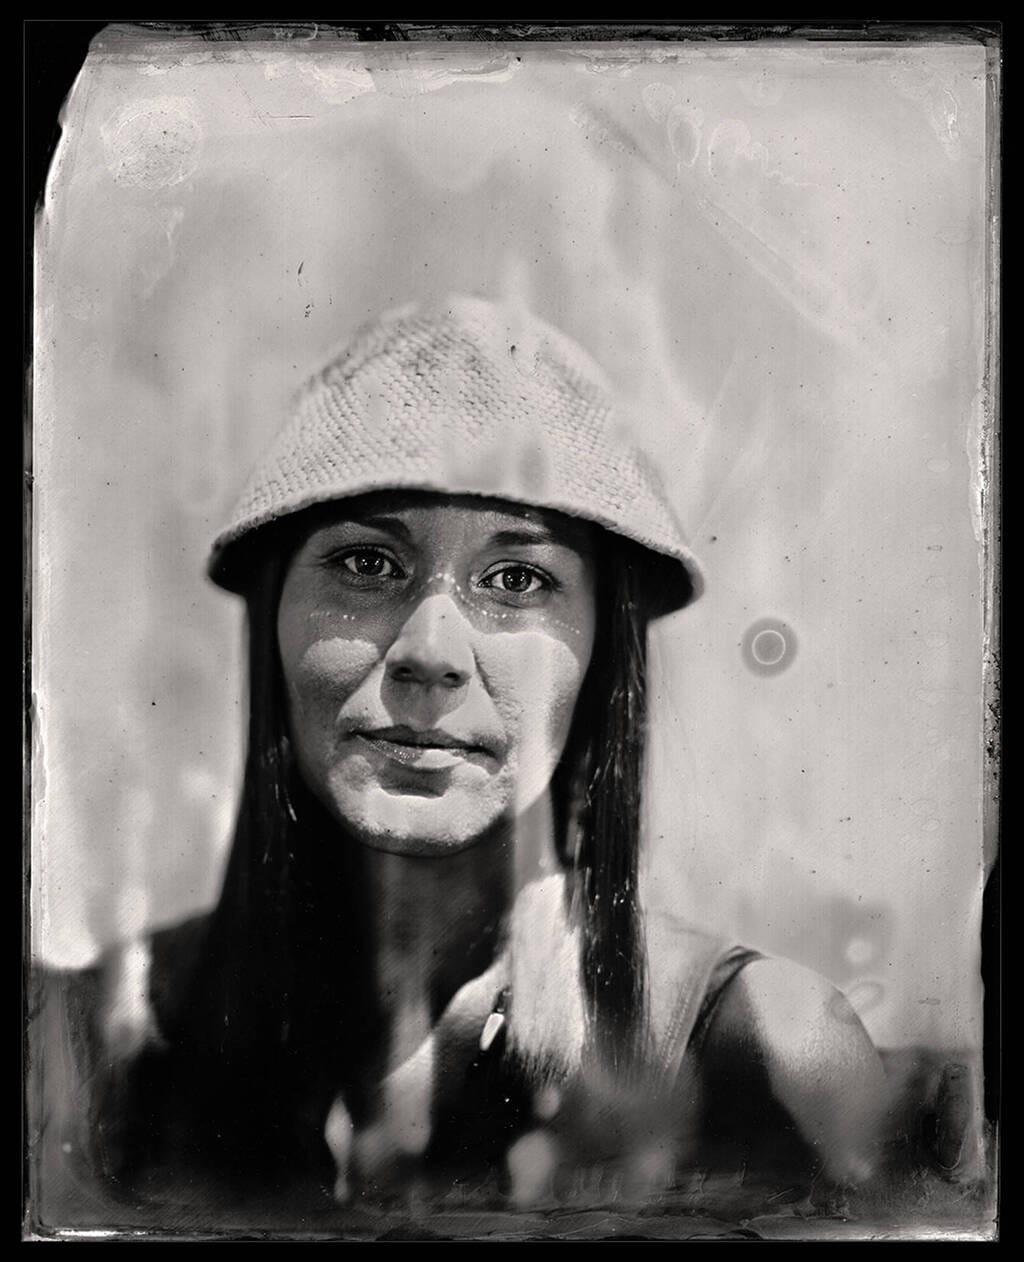 Cara Romero, citizen of the Chemehuevi tribe, CIPX, 2012.